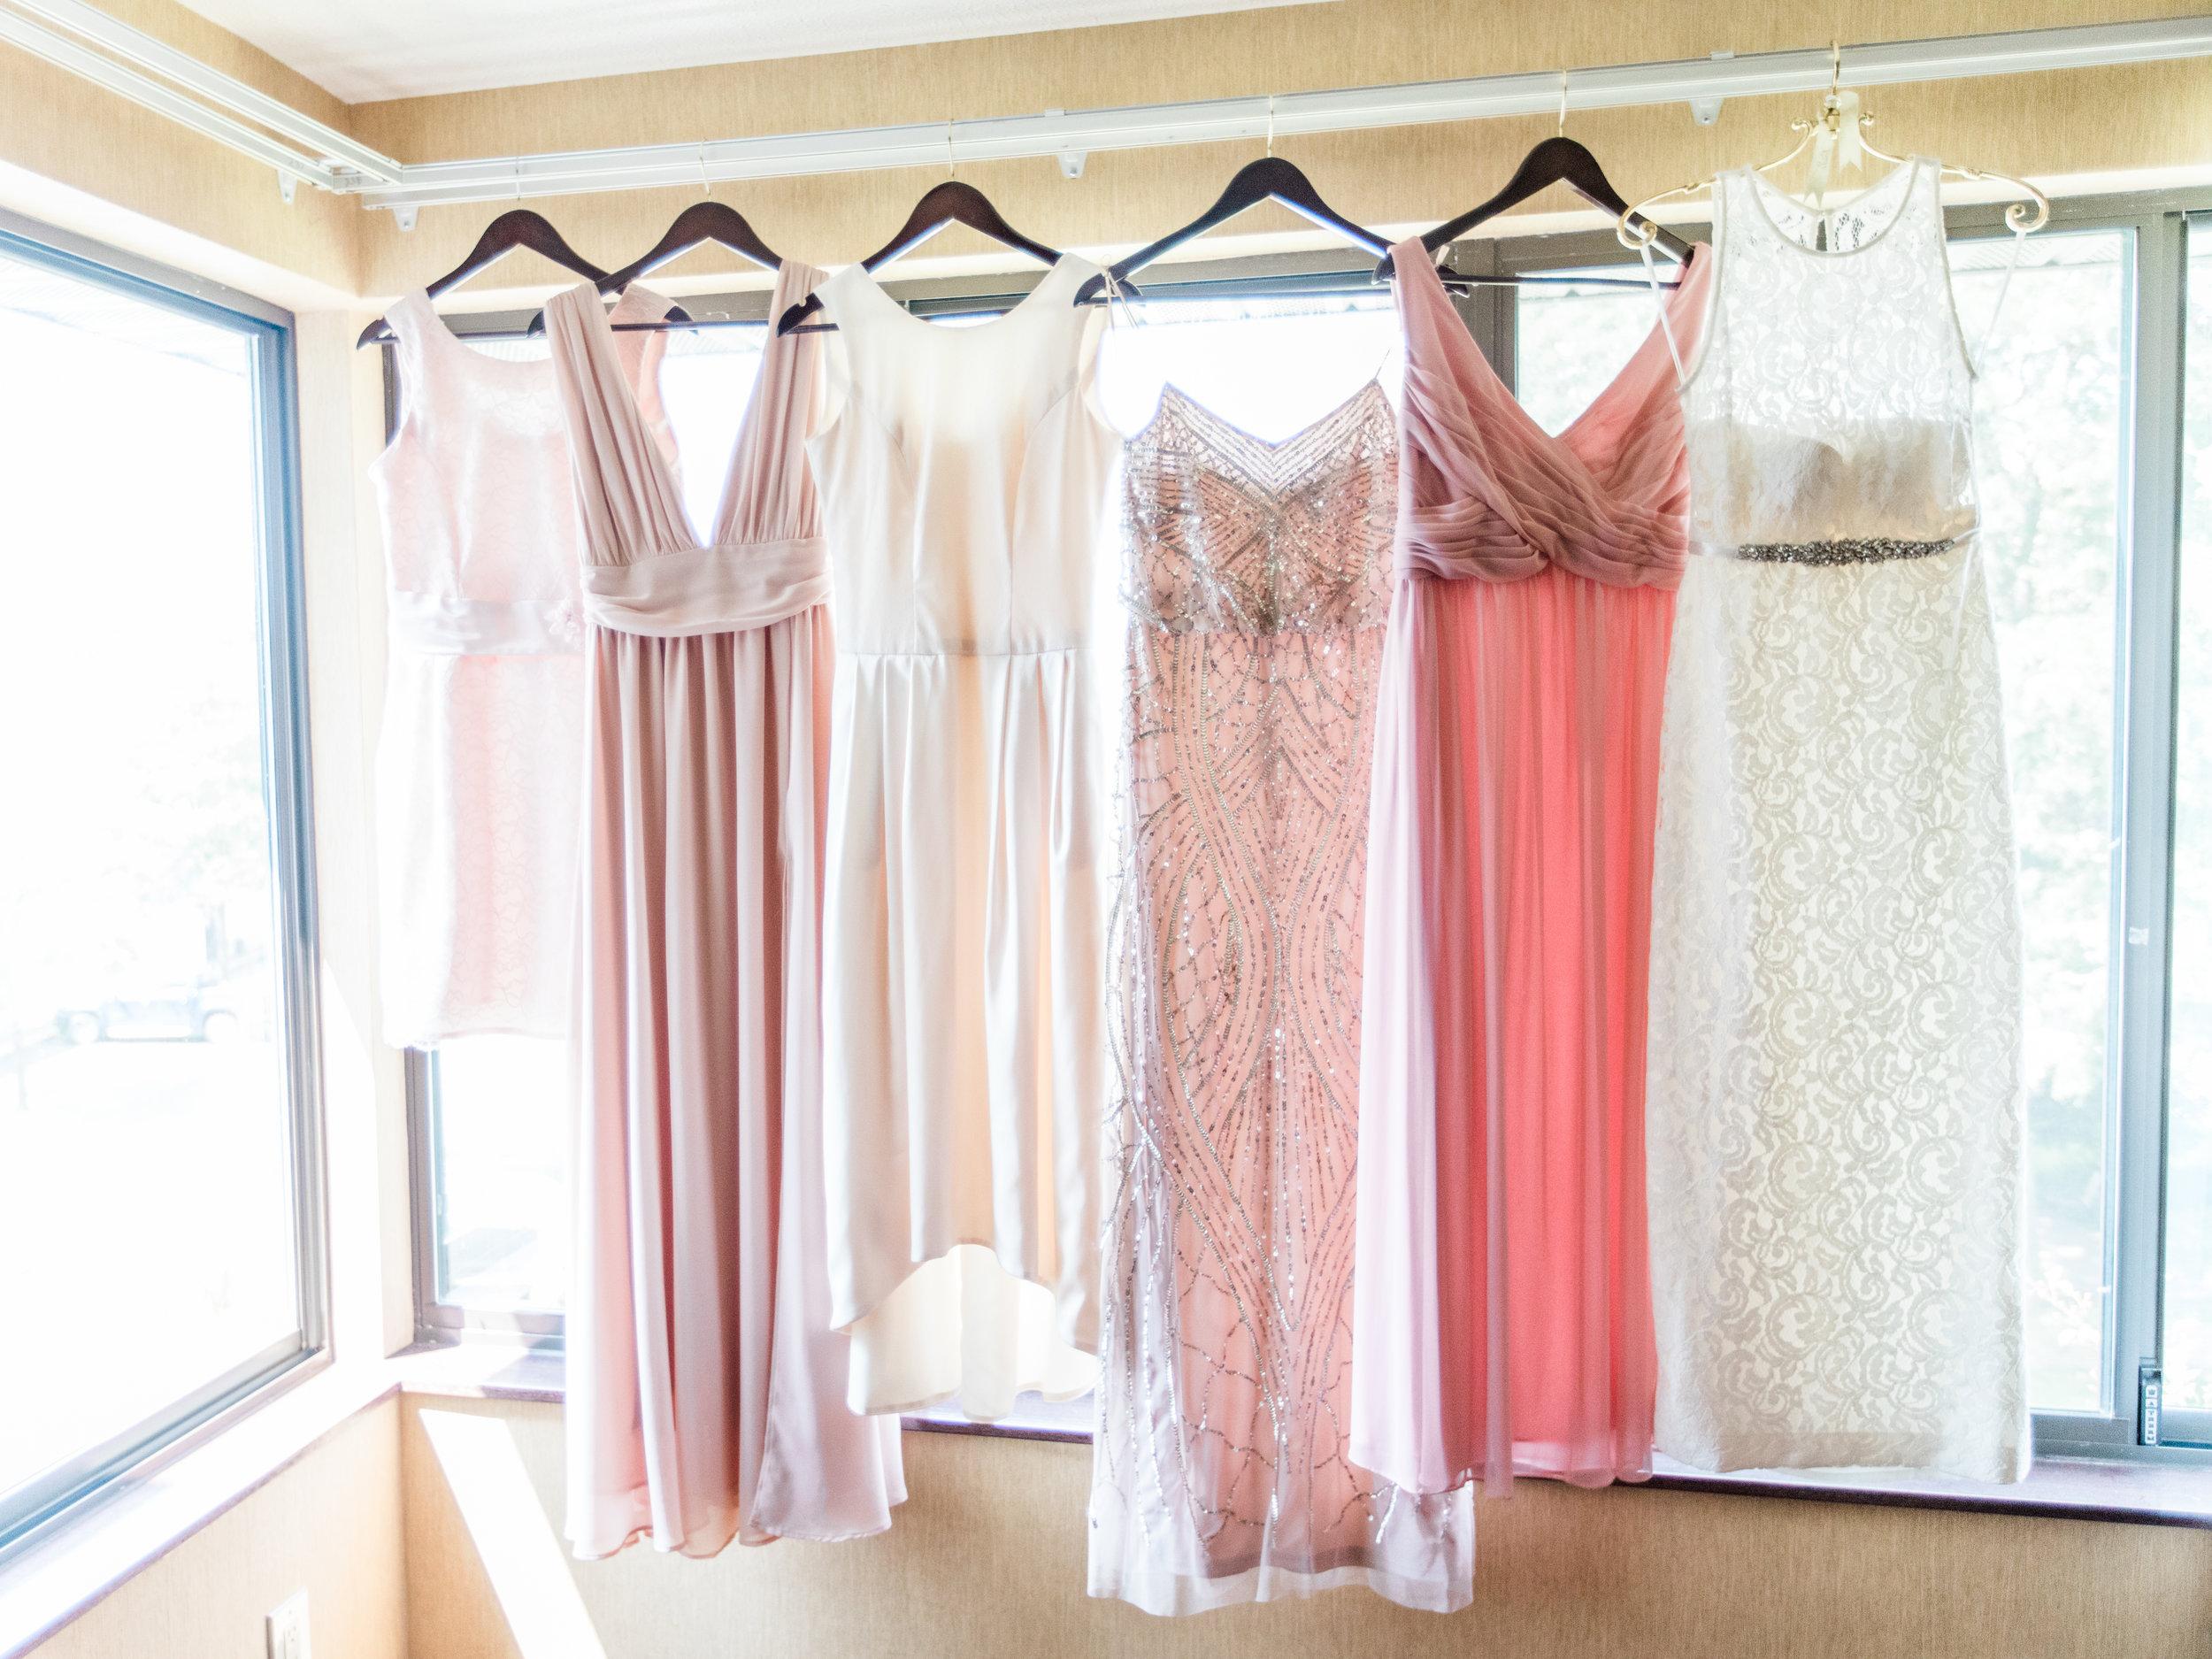 Zoller+Wedding+Getting+Ready-11.jpg